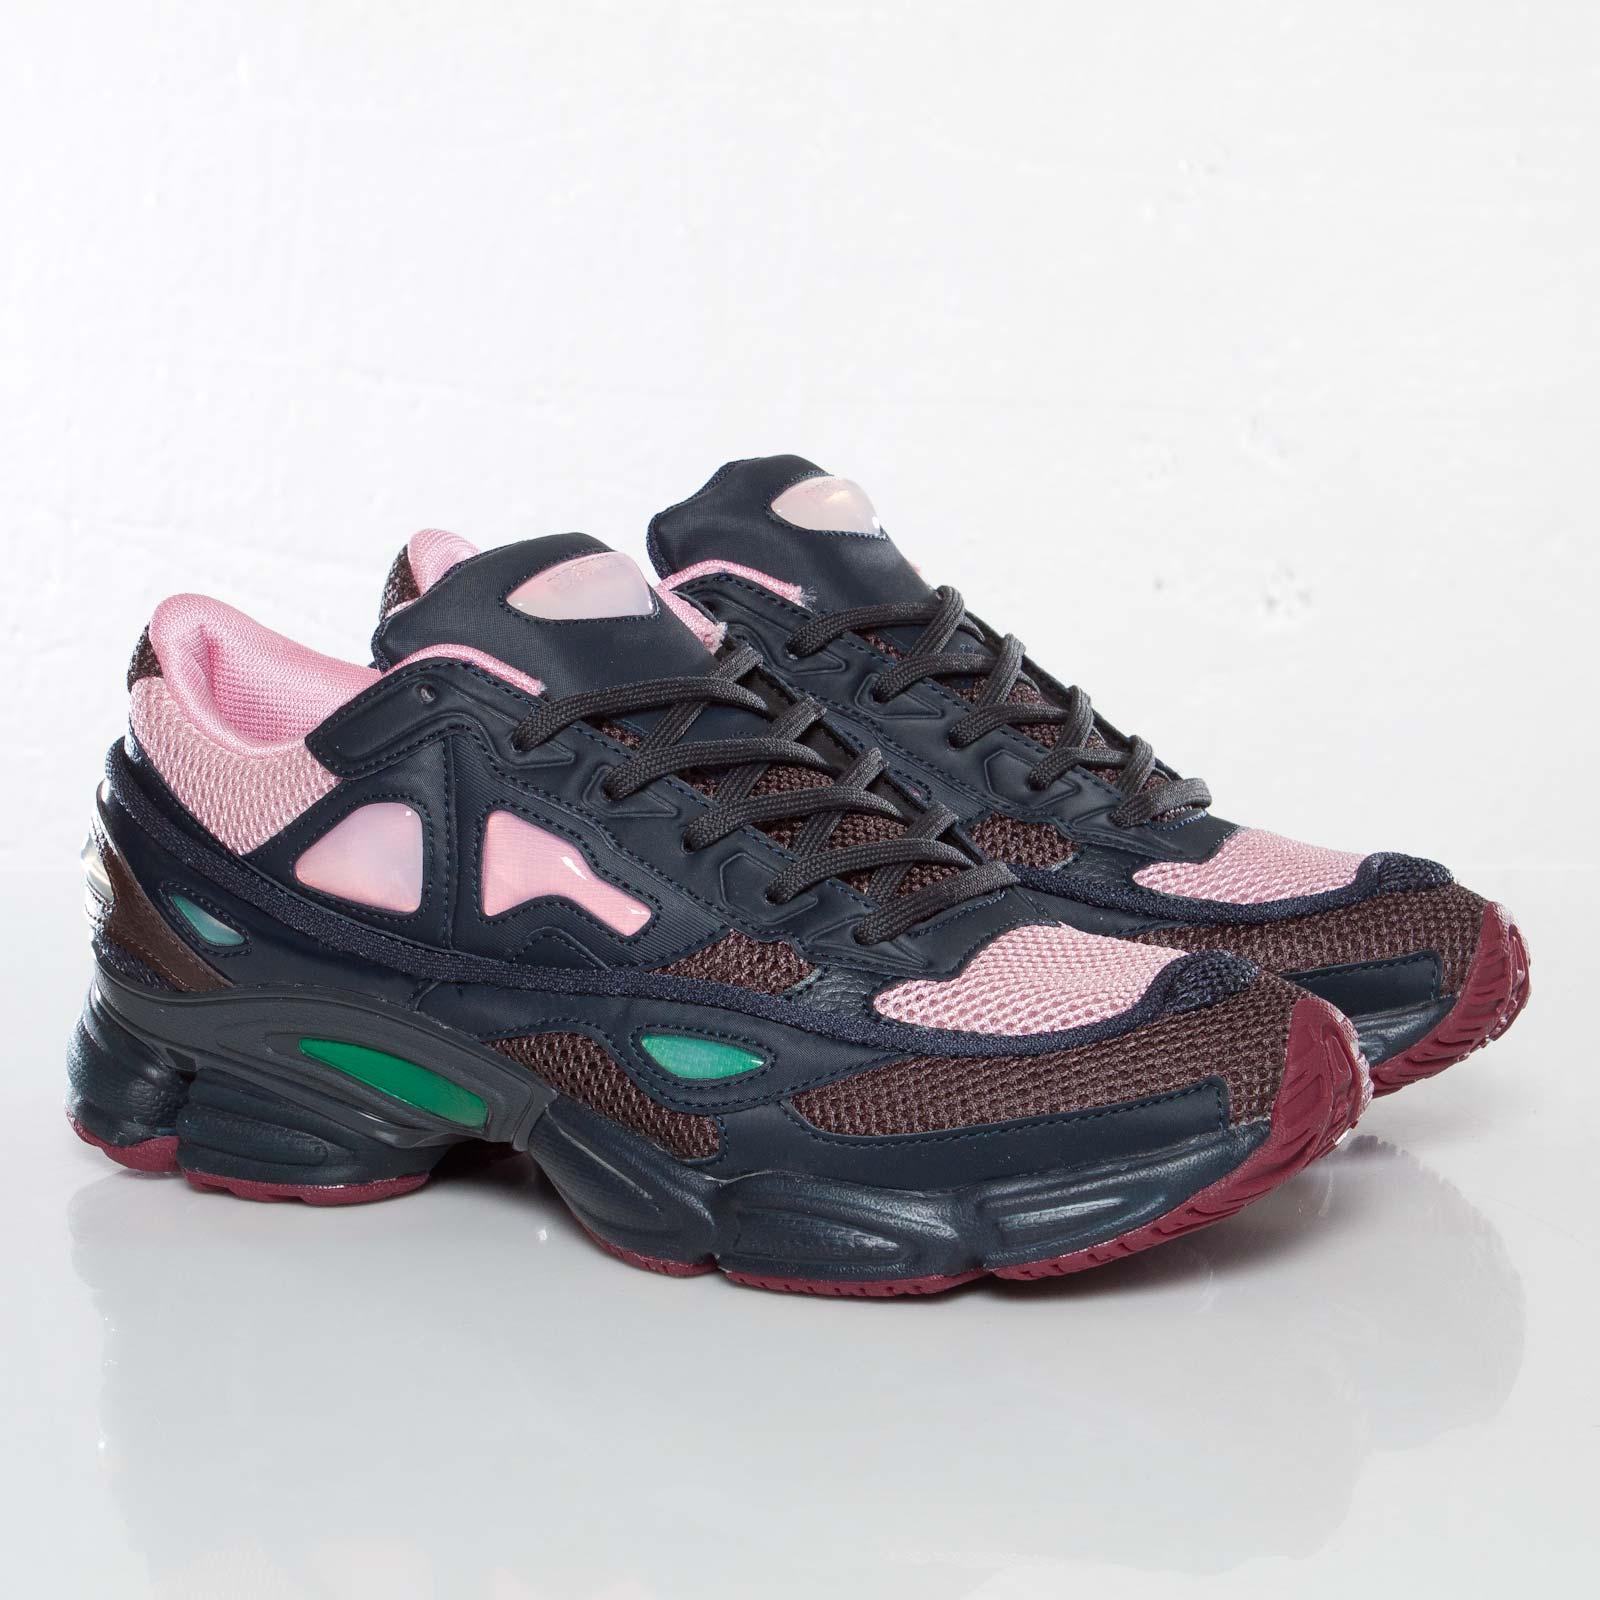 premier taux 0a8c1 ff737 adidas Raf Simons Ozweego 2 - D66402 - Sneakersnstuff ...